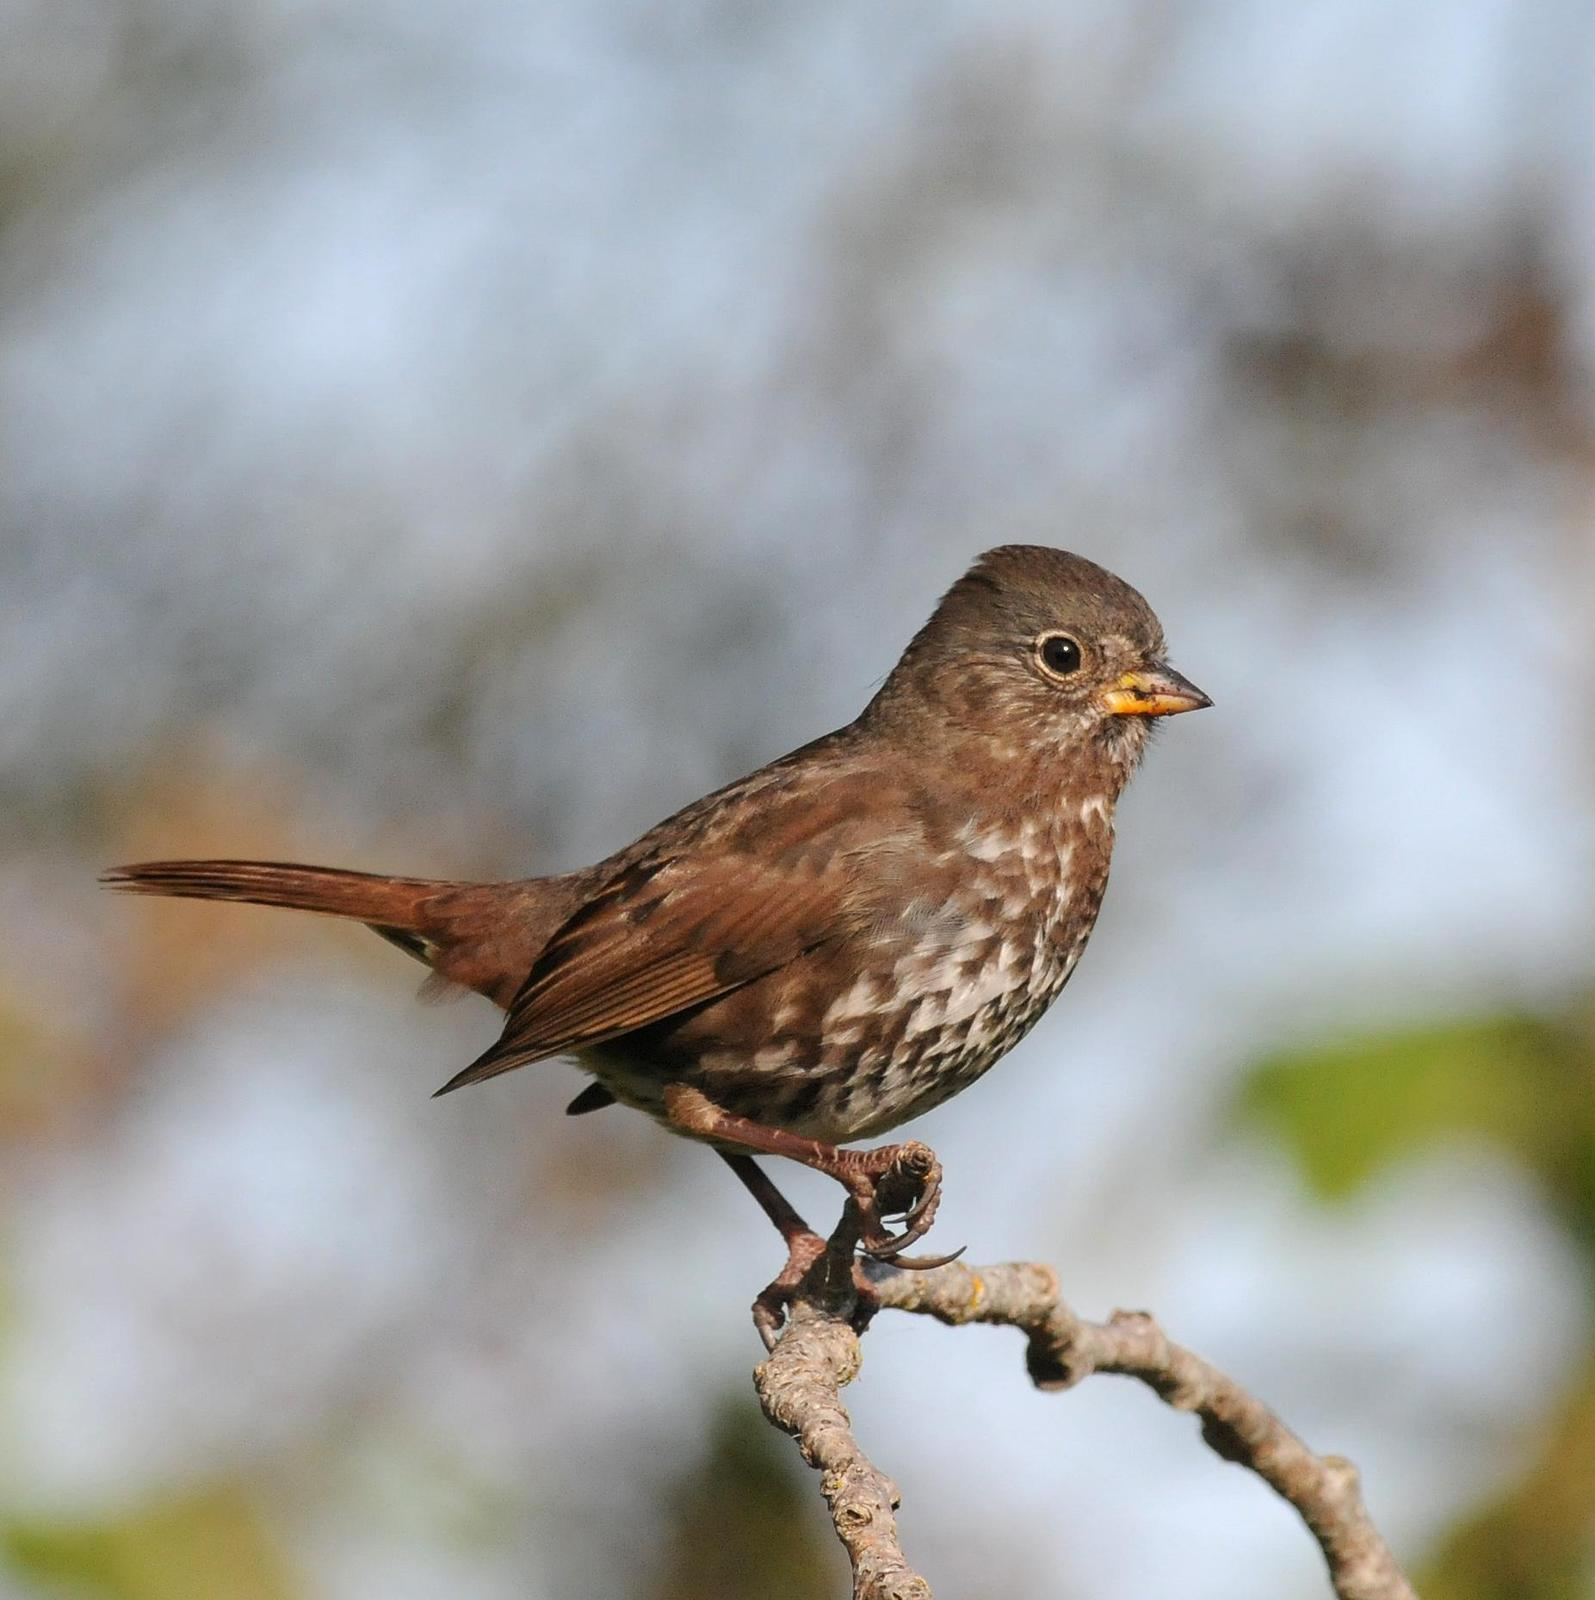 Fox Sparrow (Sooty) Photo by Steven Mlodinow